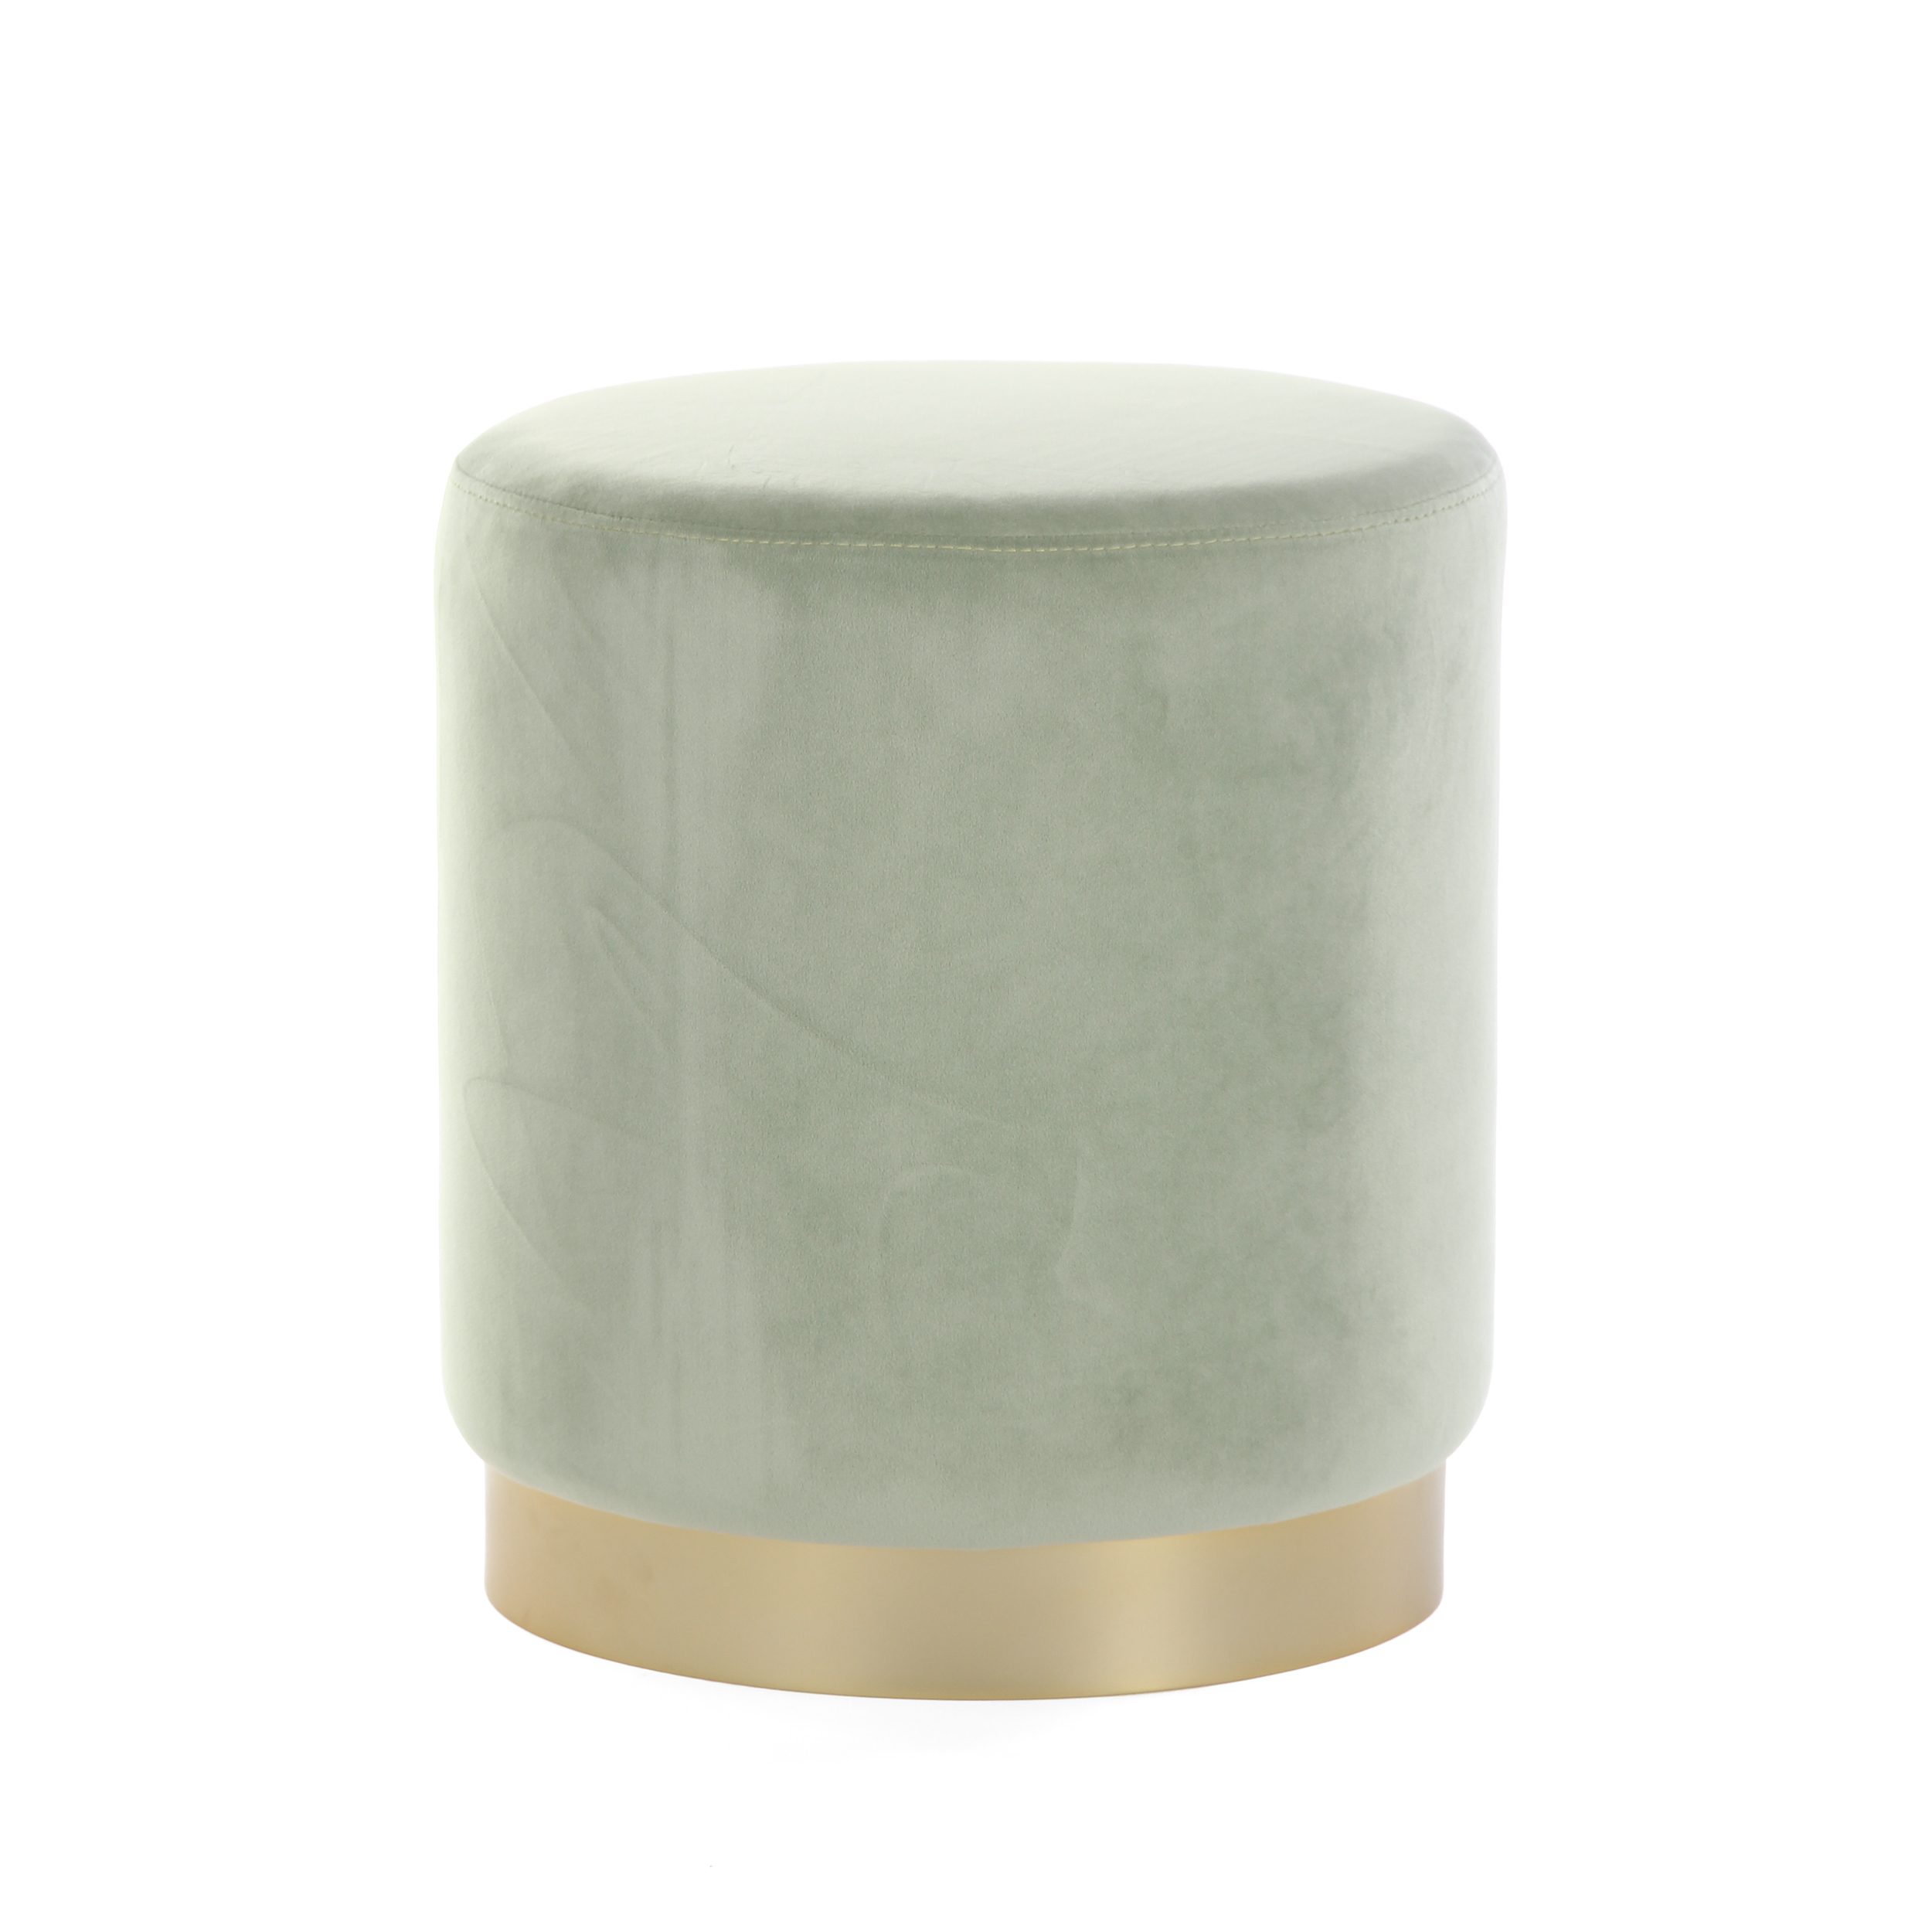 Пуф Dior диаметр 40